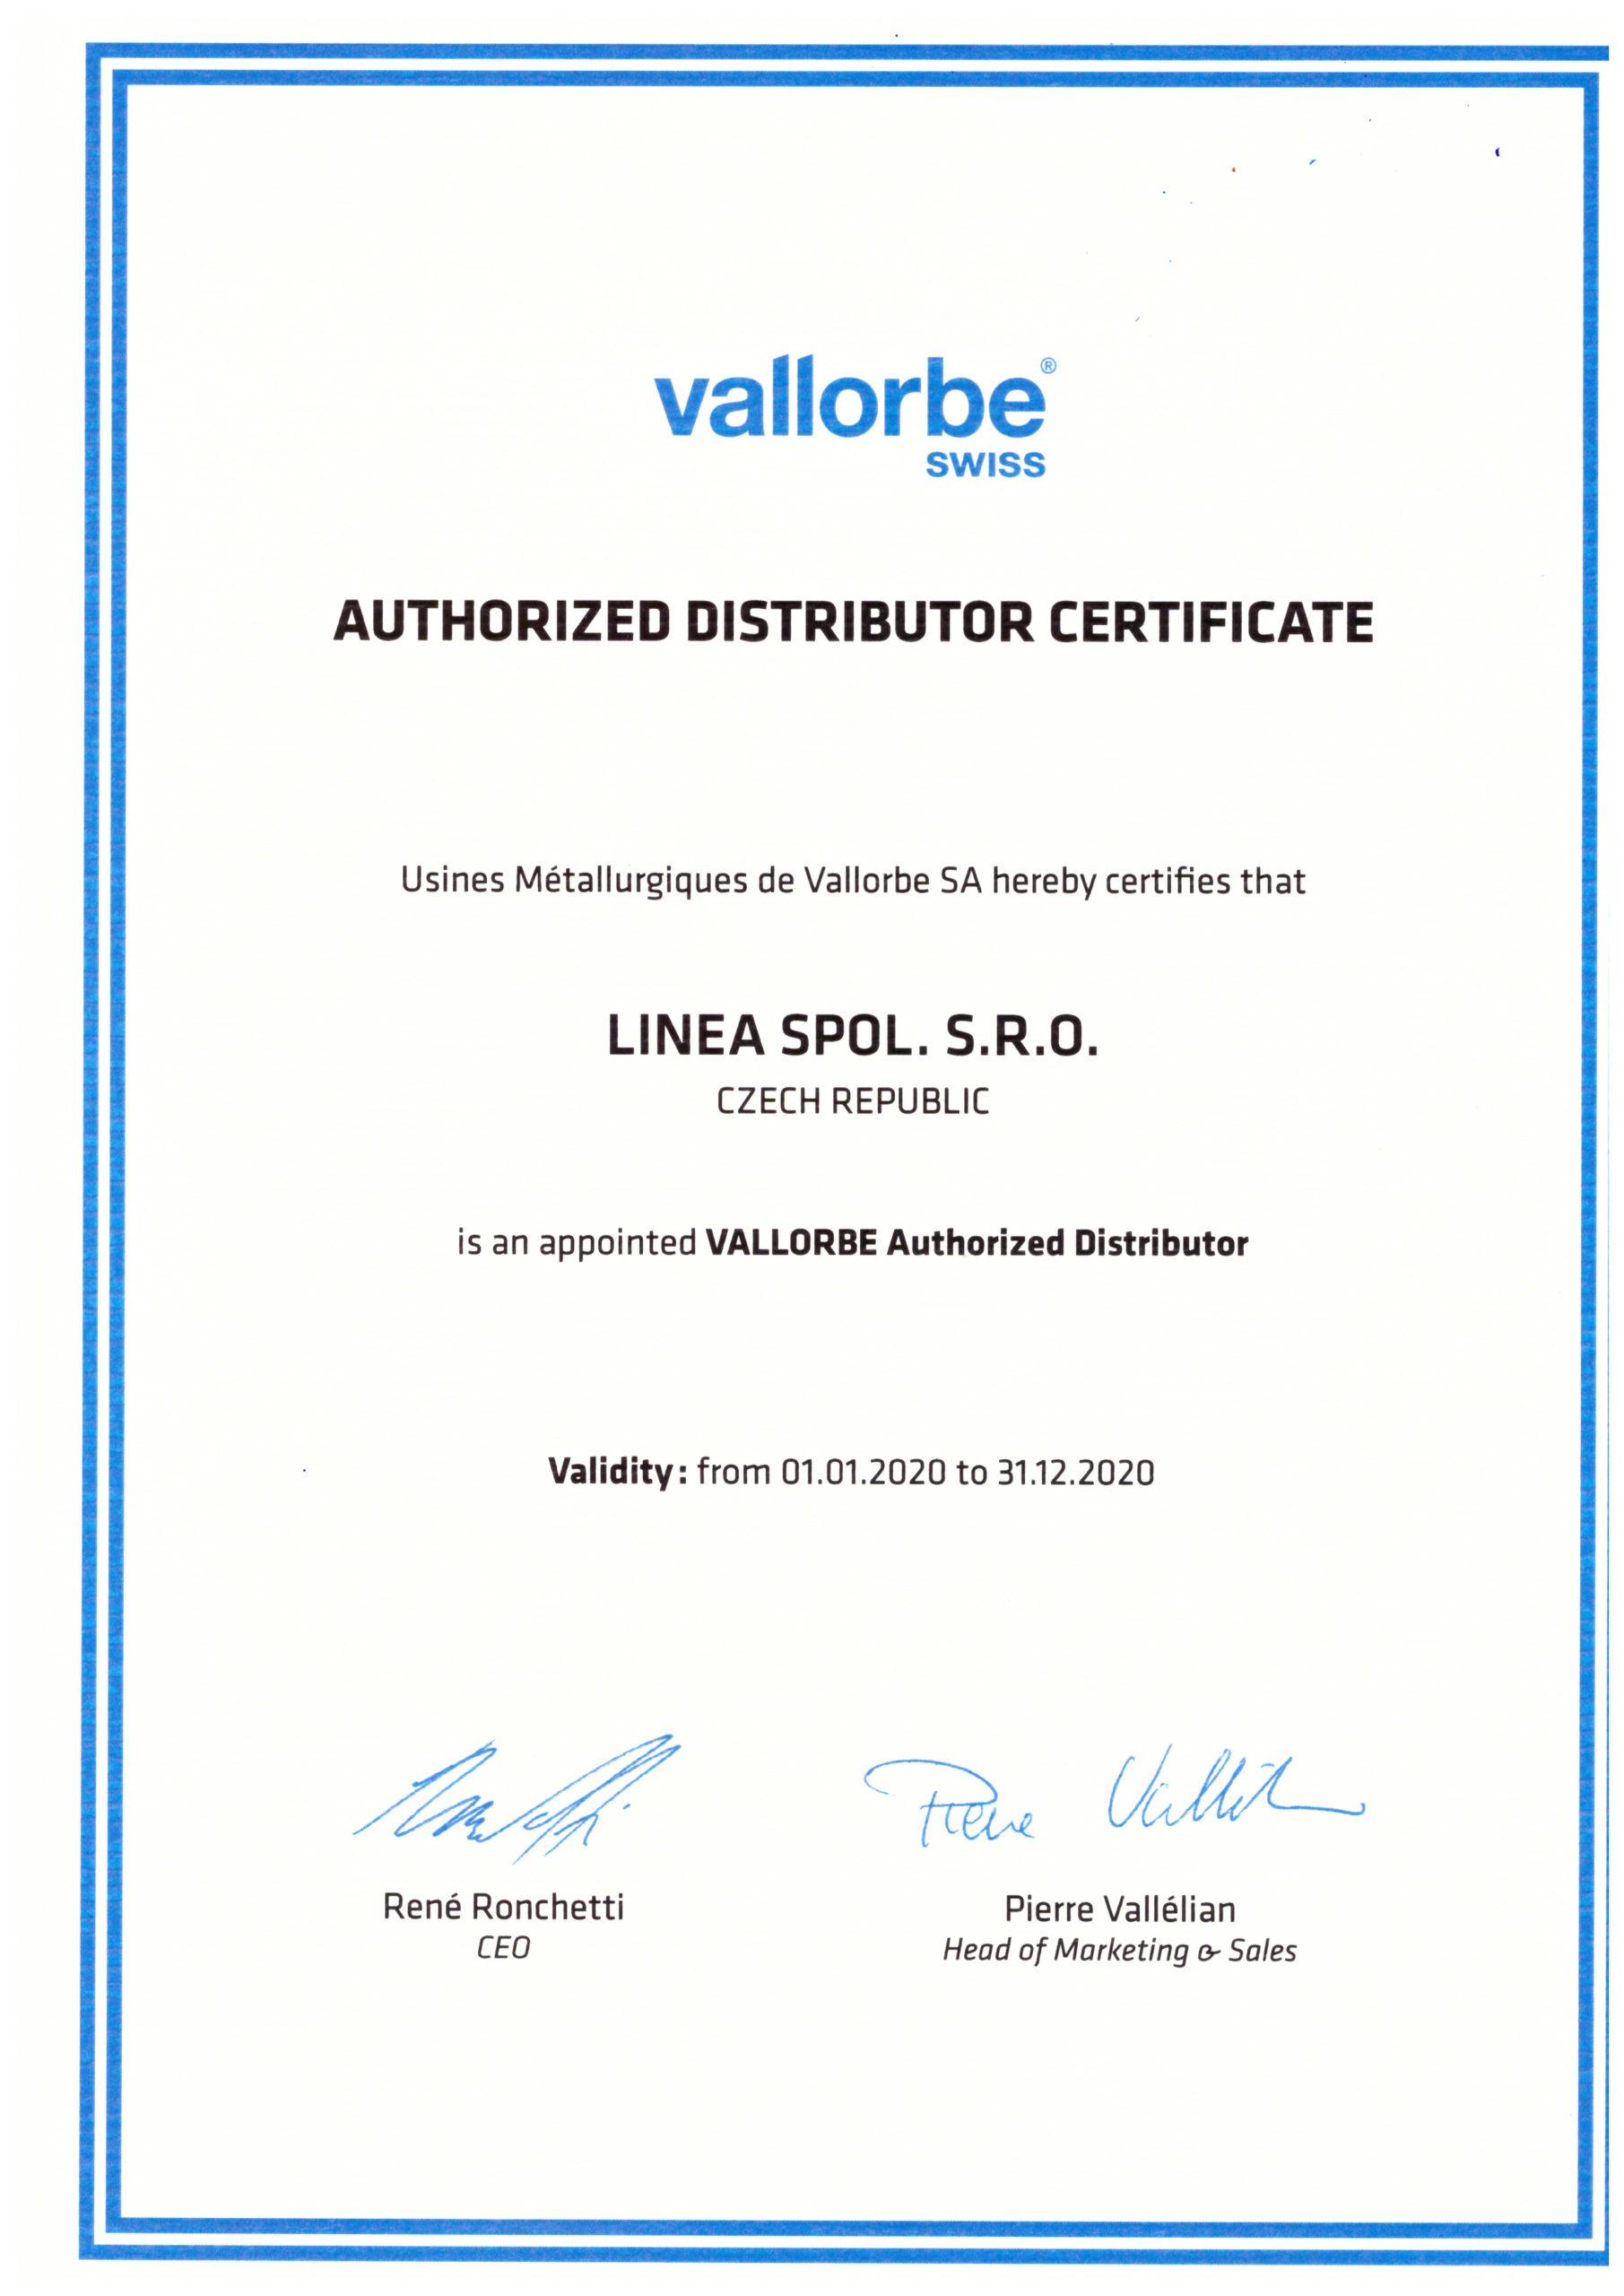 UMV certifikát 2020